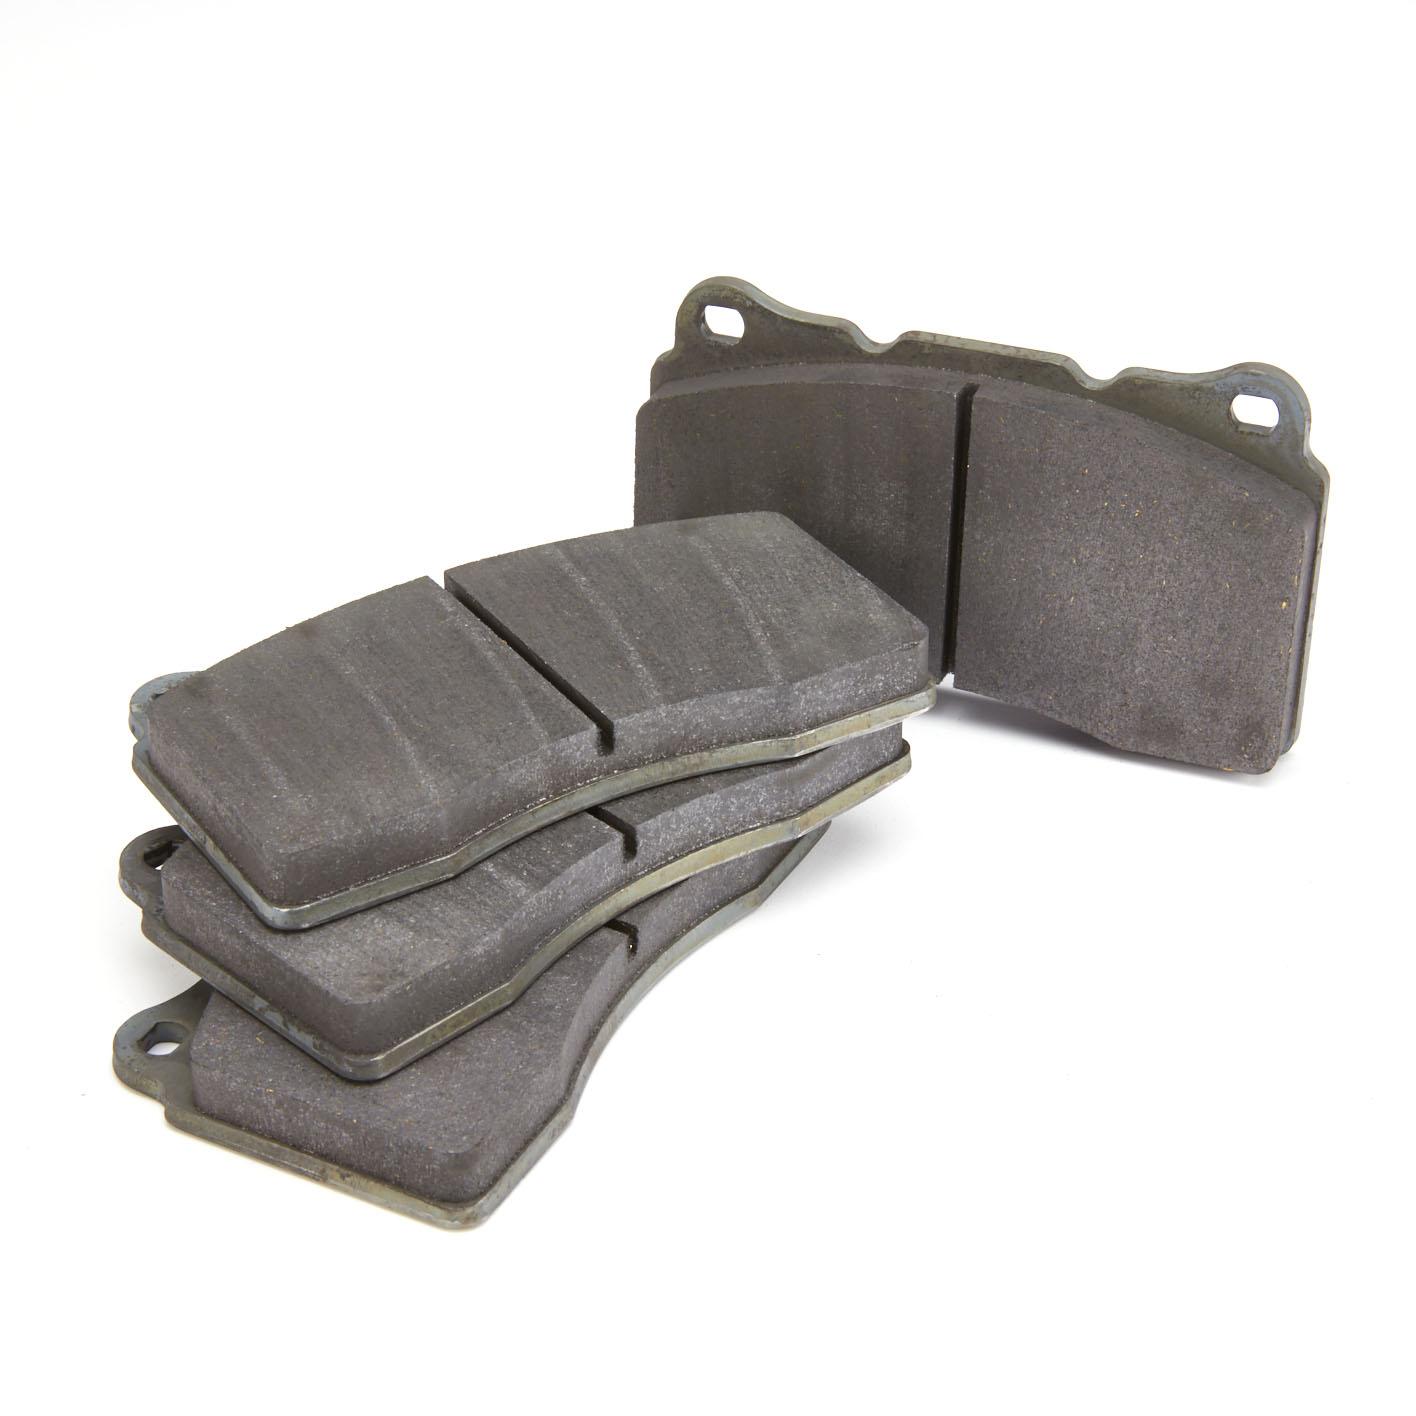 ST43R1001.15 RAYBESTOS rear pads